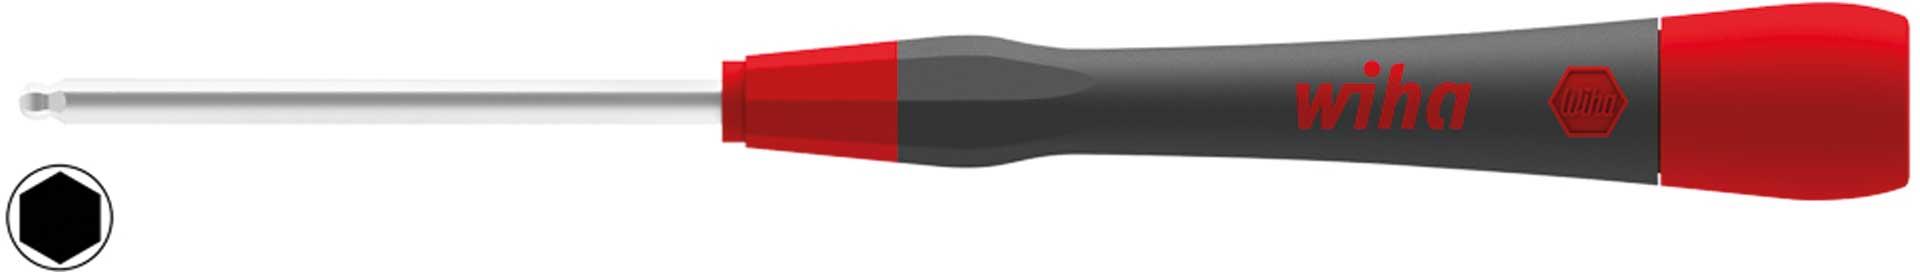 WIHA Kugelkopf Sechskant 3,0 x 60mm